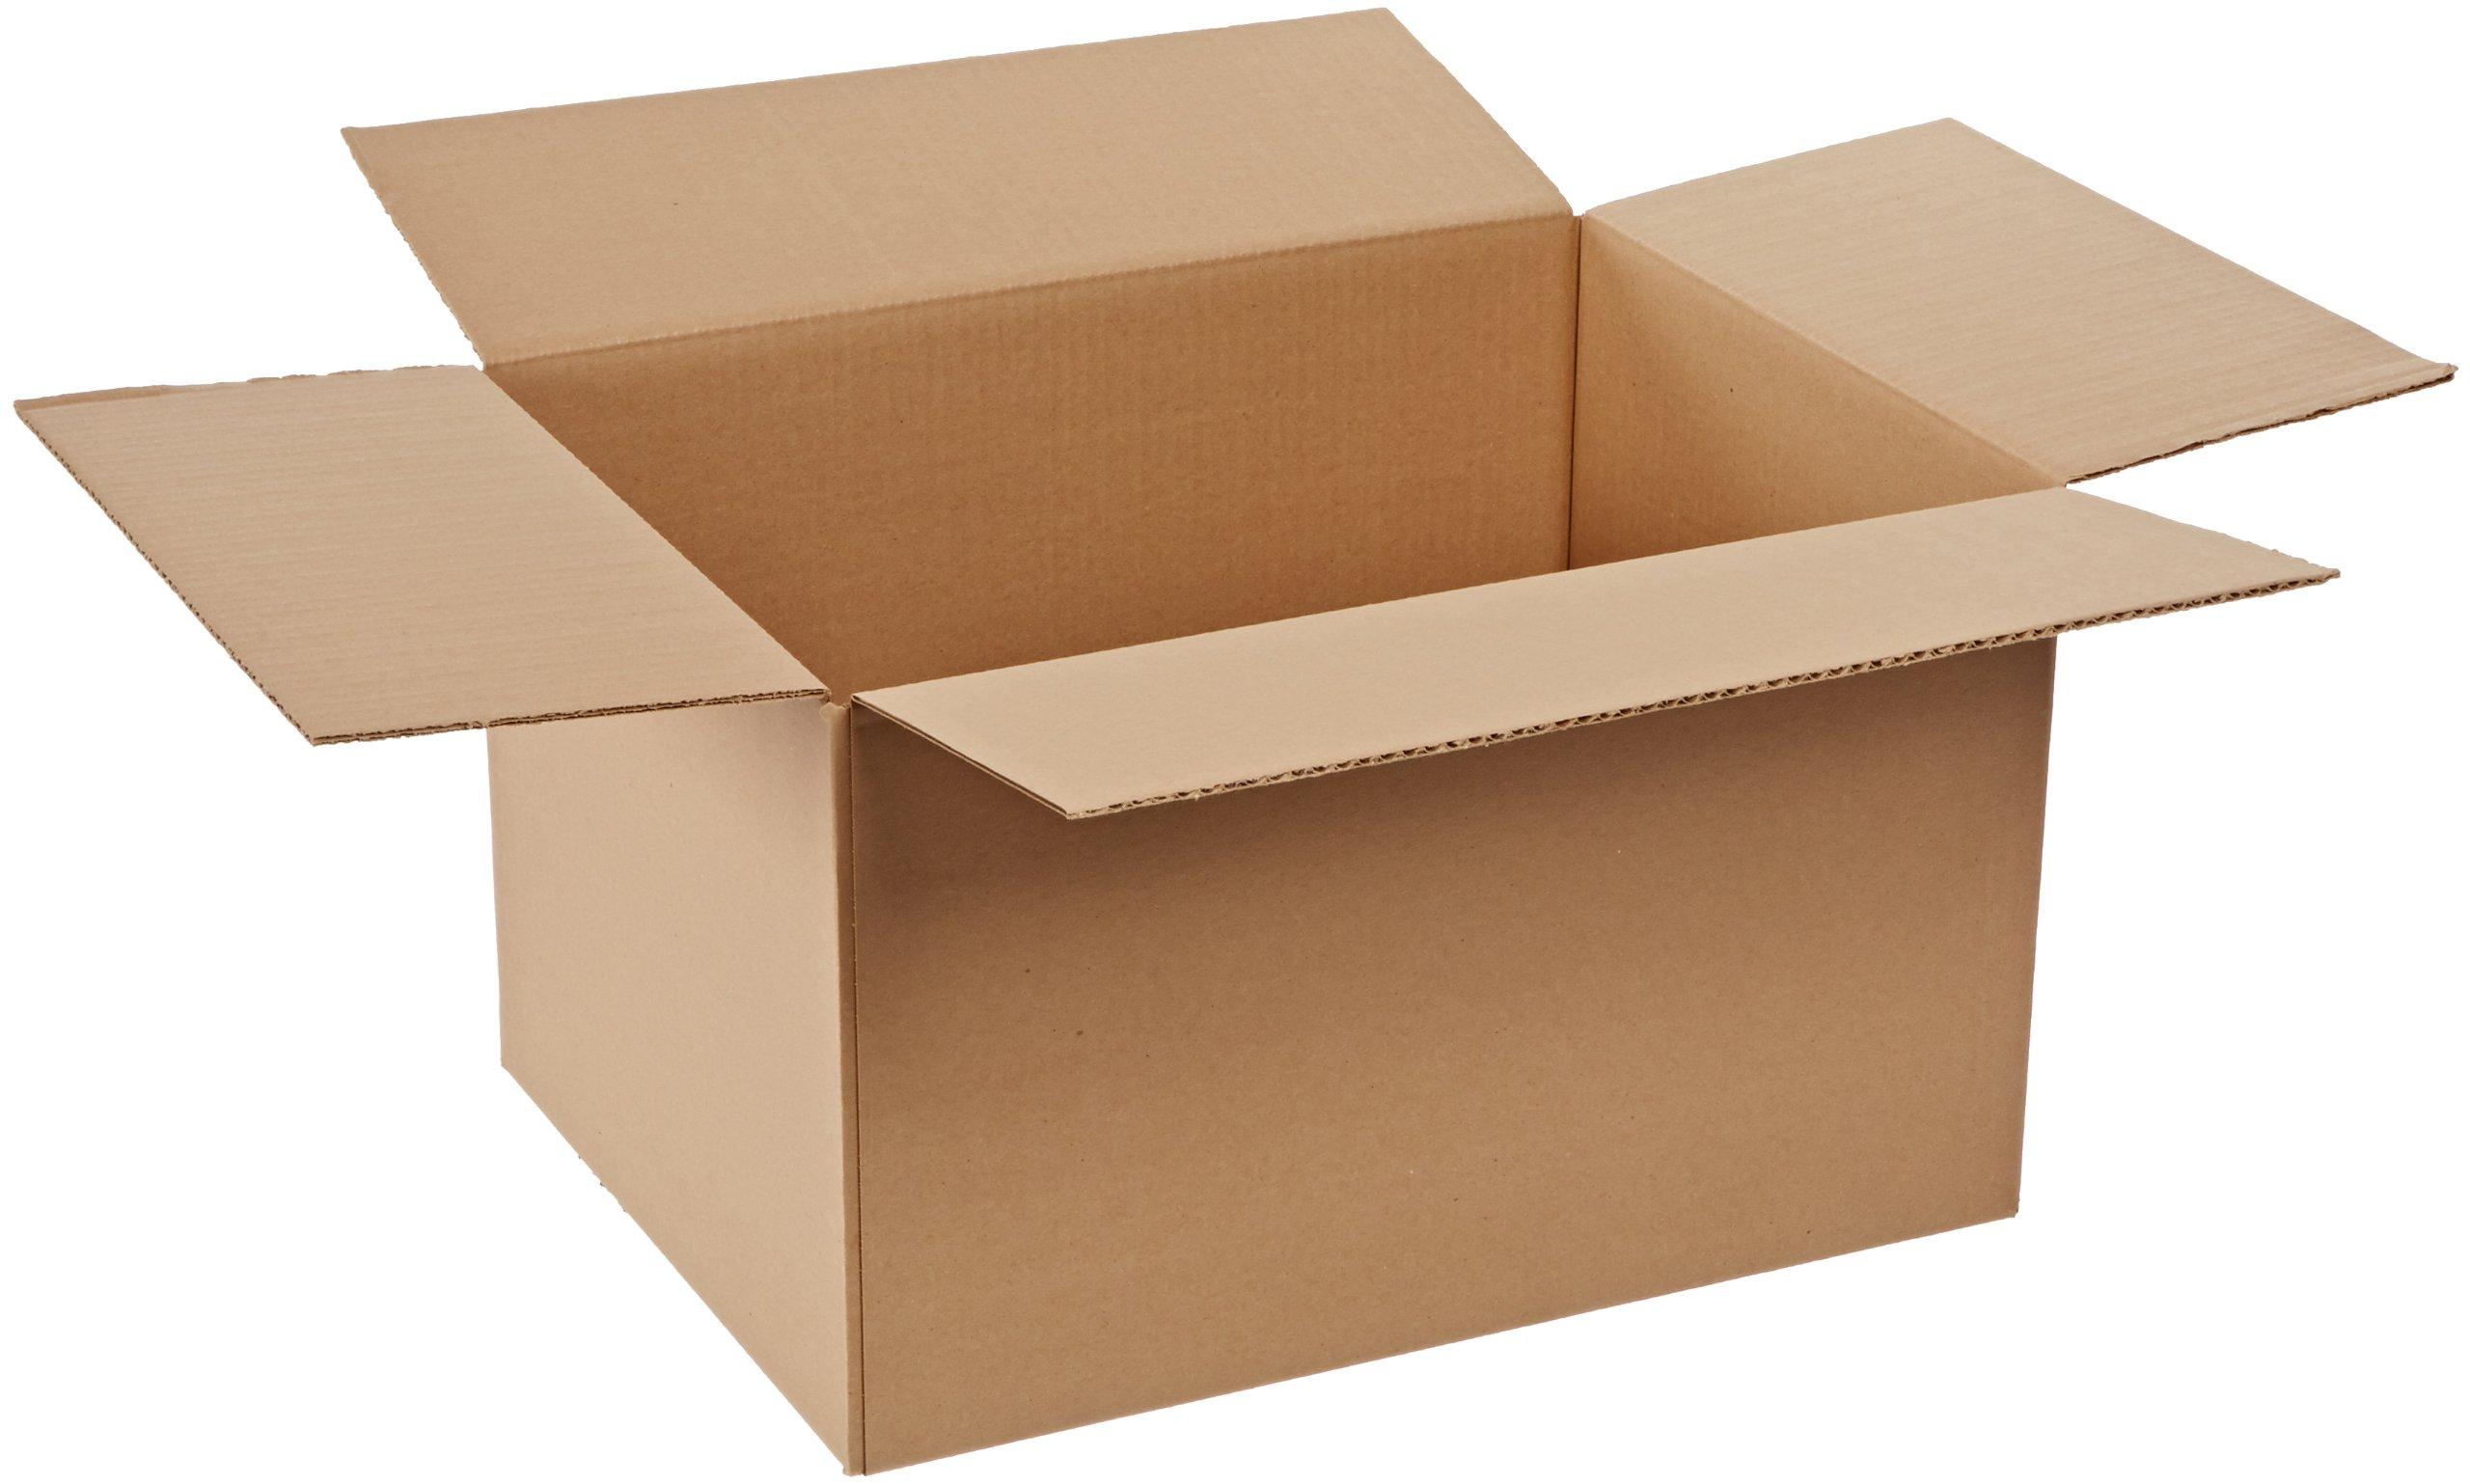 Aviditi 201512 Corrugated Box, 20'' Length x 15'' Width x 12'' Height, Kraft (Bundle of 25)